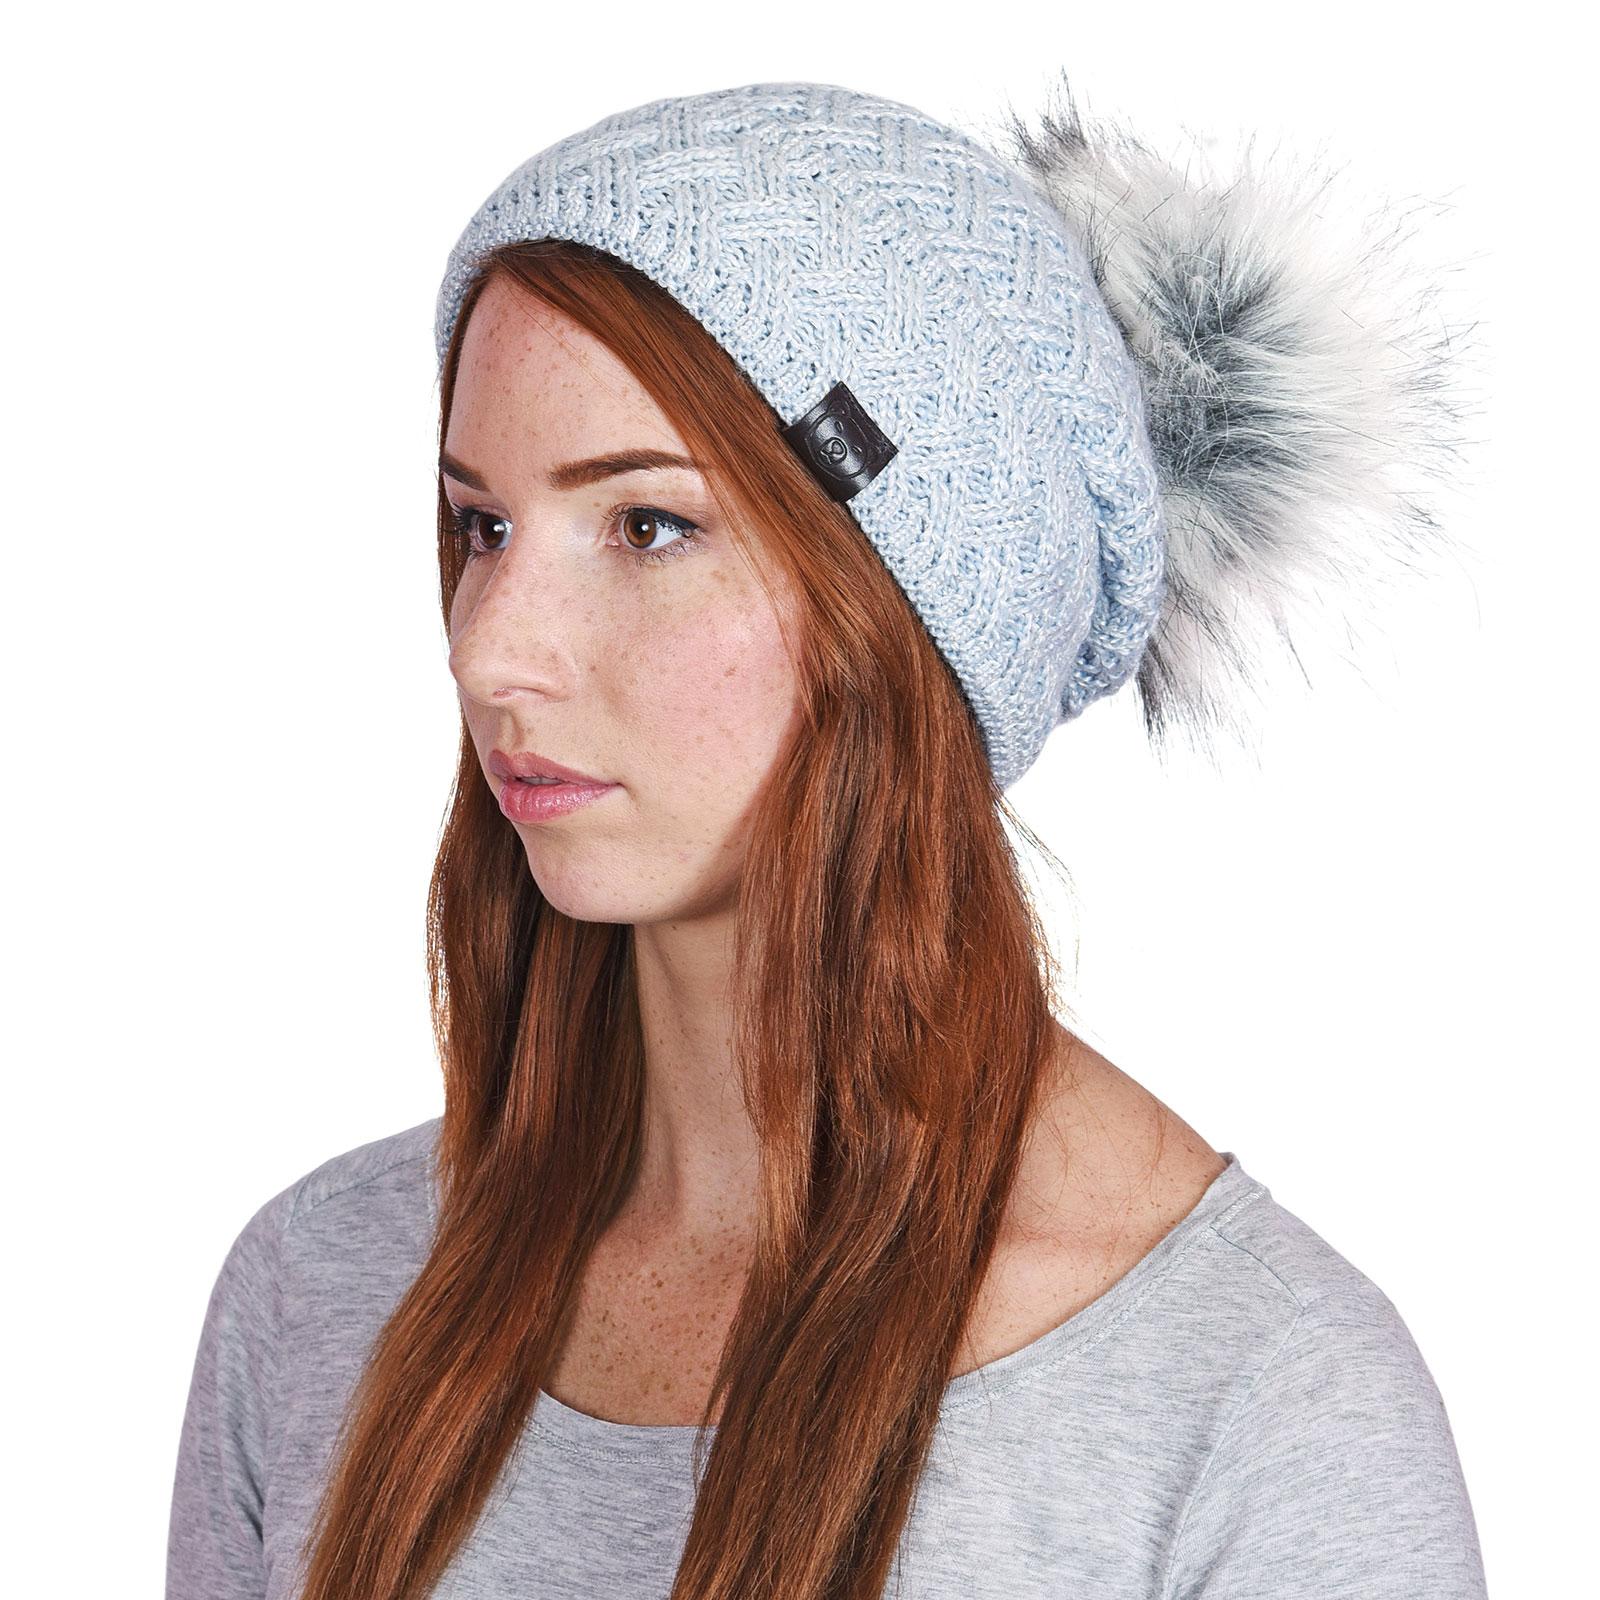 CP-01031-VF16-P-bonnet-hiver-bleu-ciel